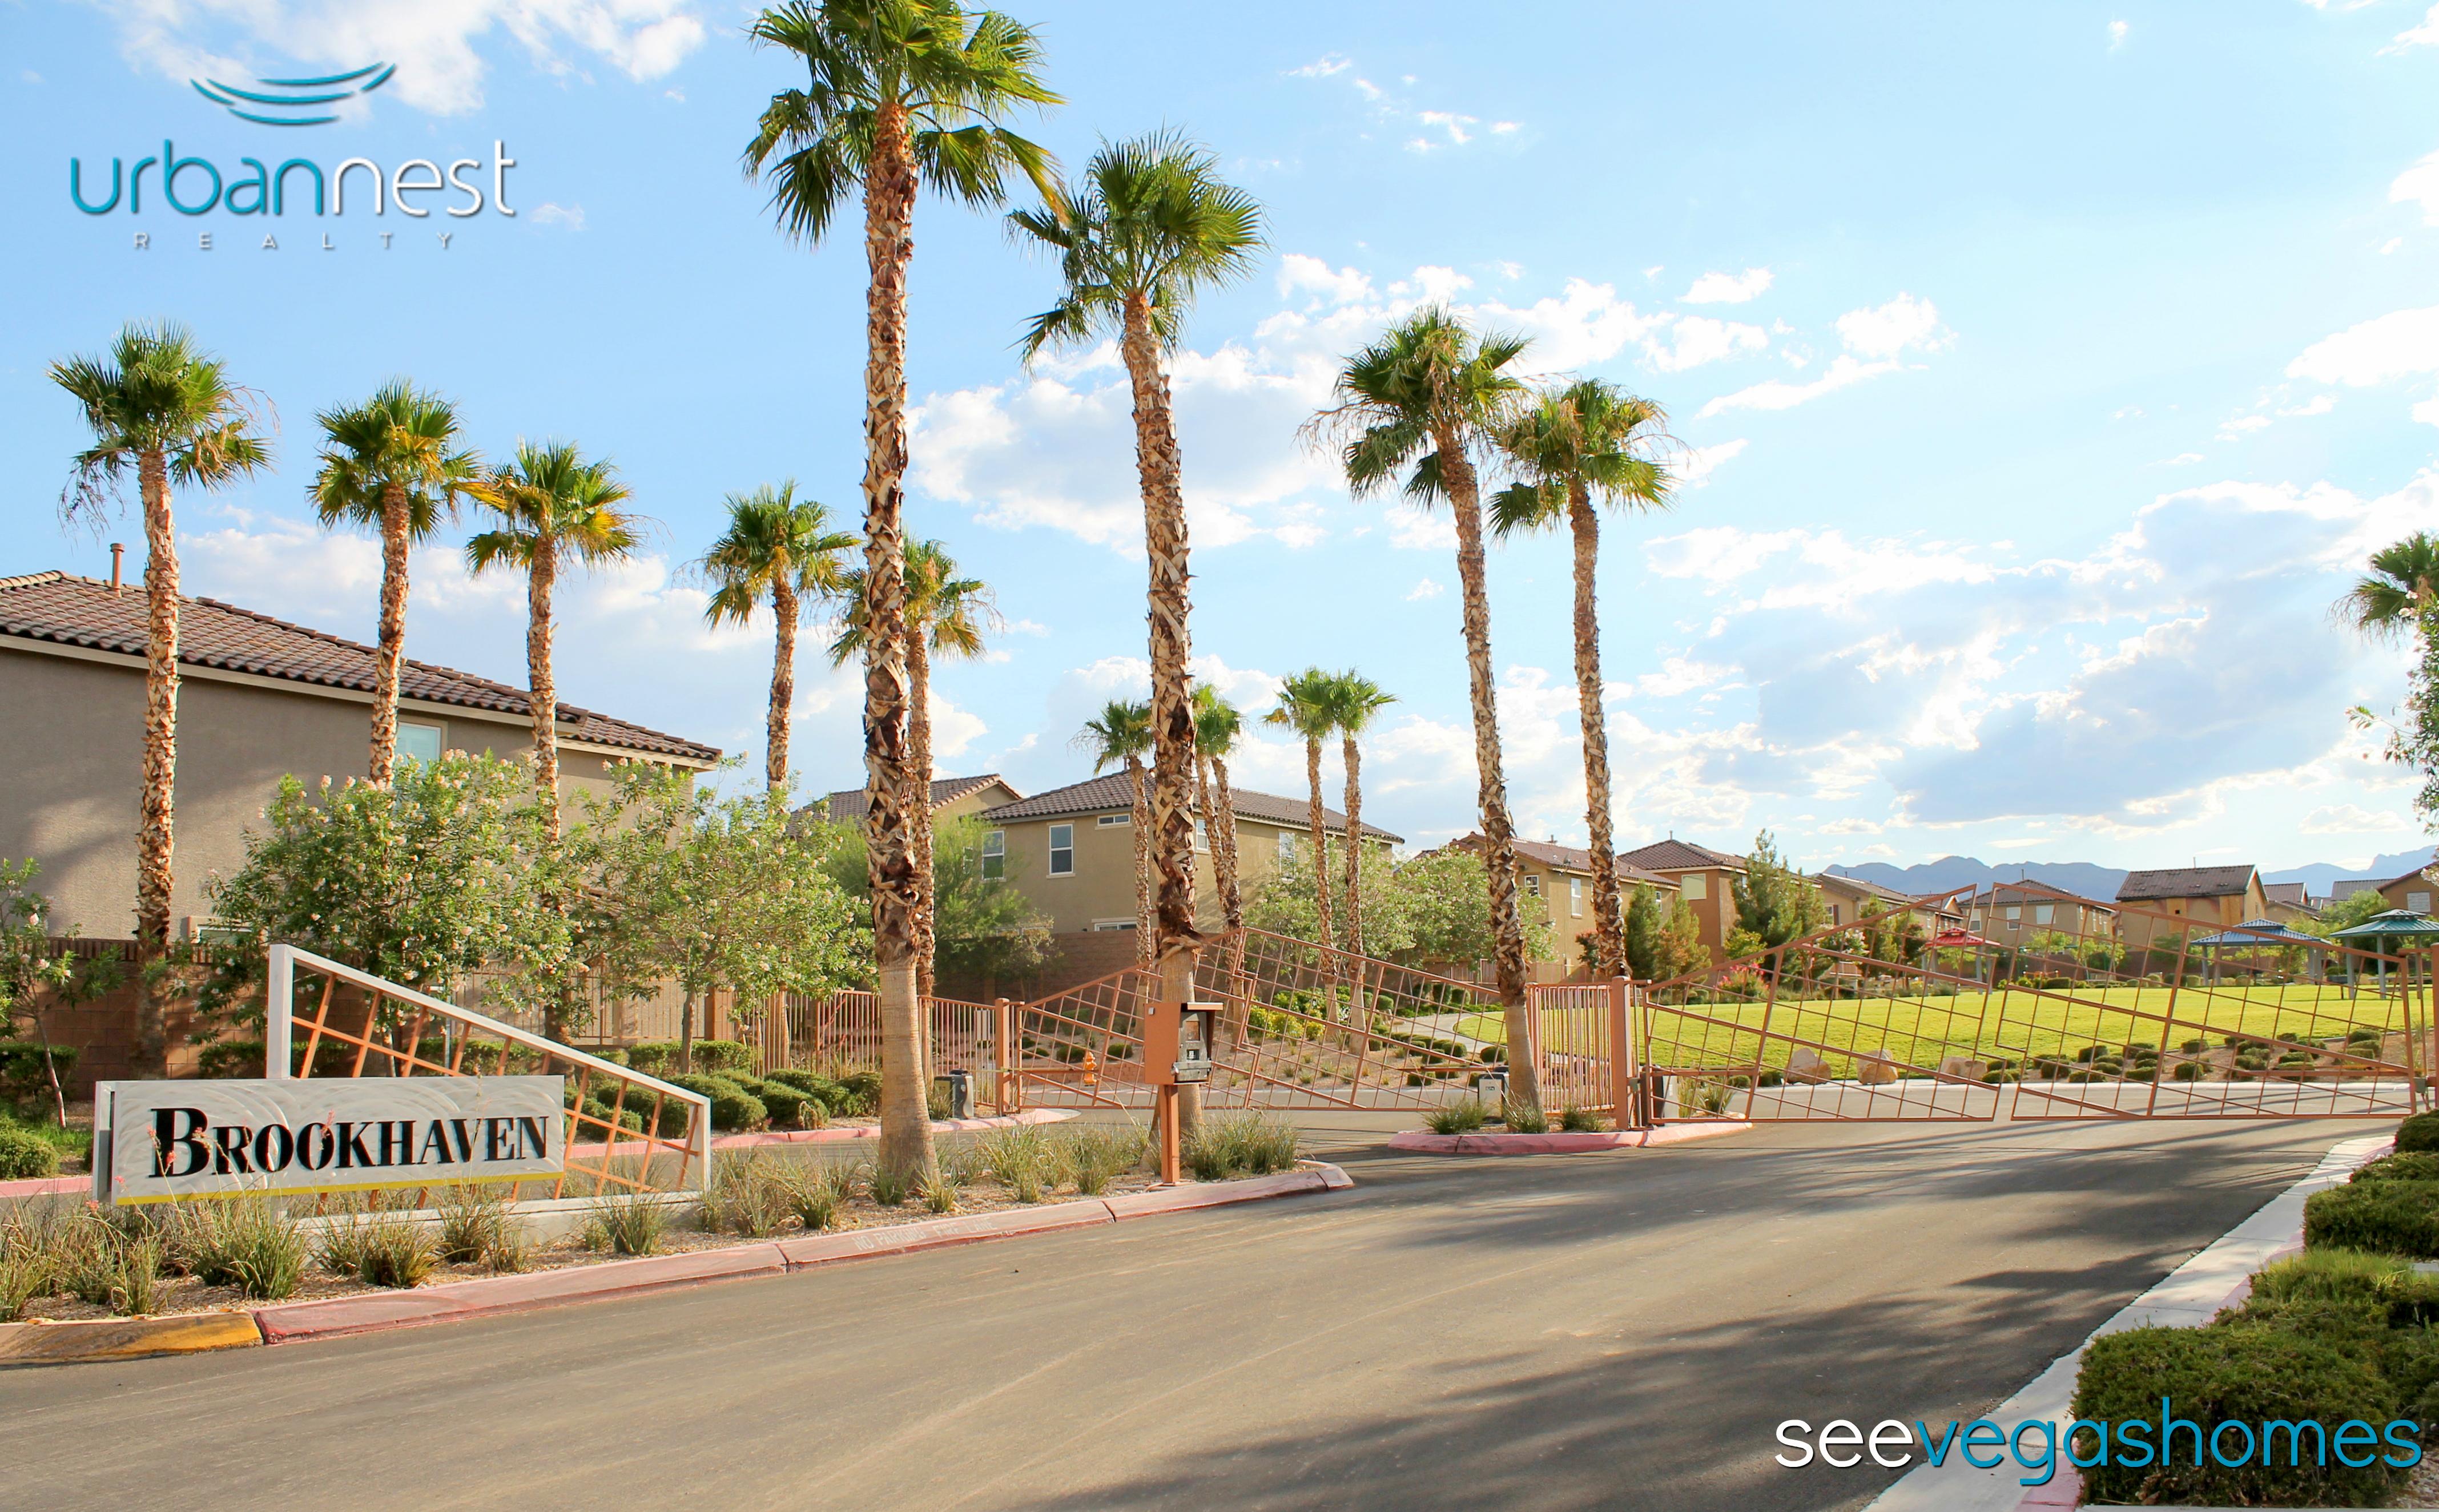 Brookhaven Las Vegas NV 89149 SeeVegasHomes